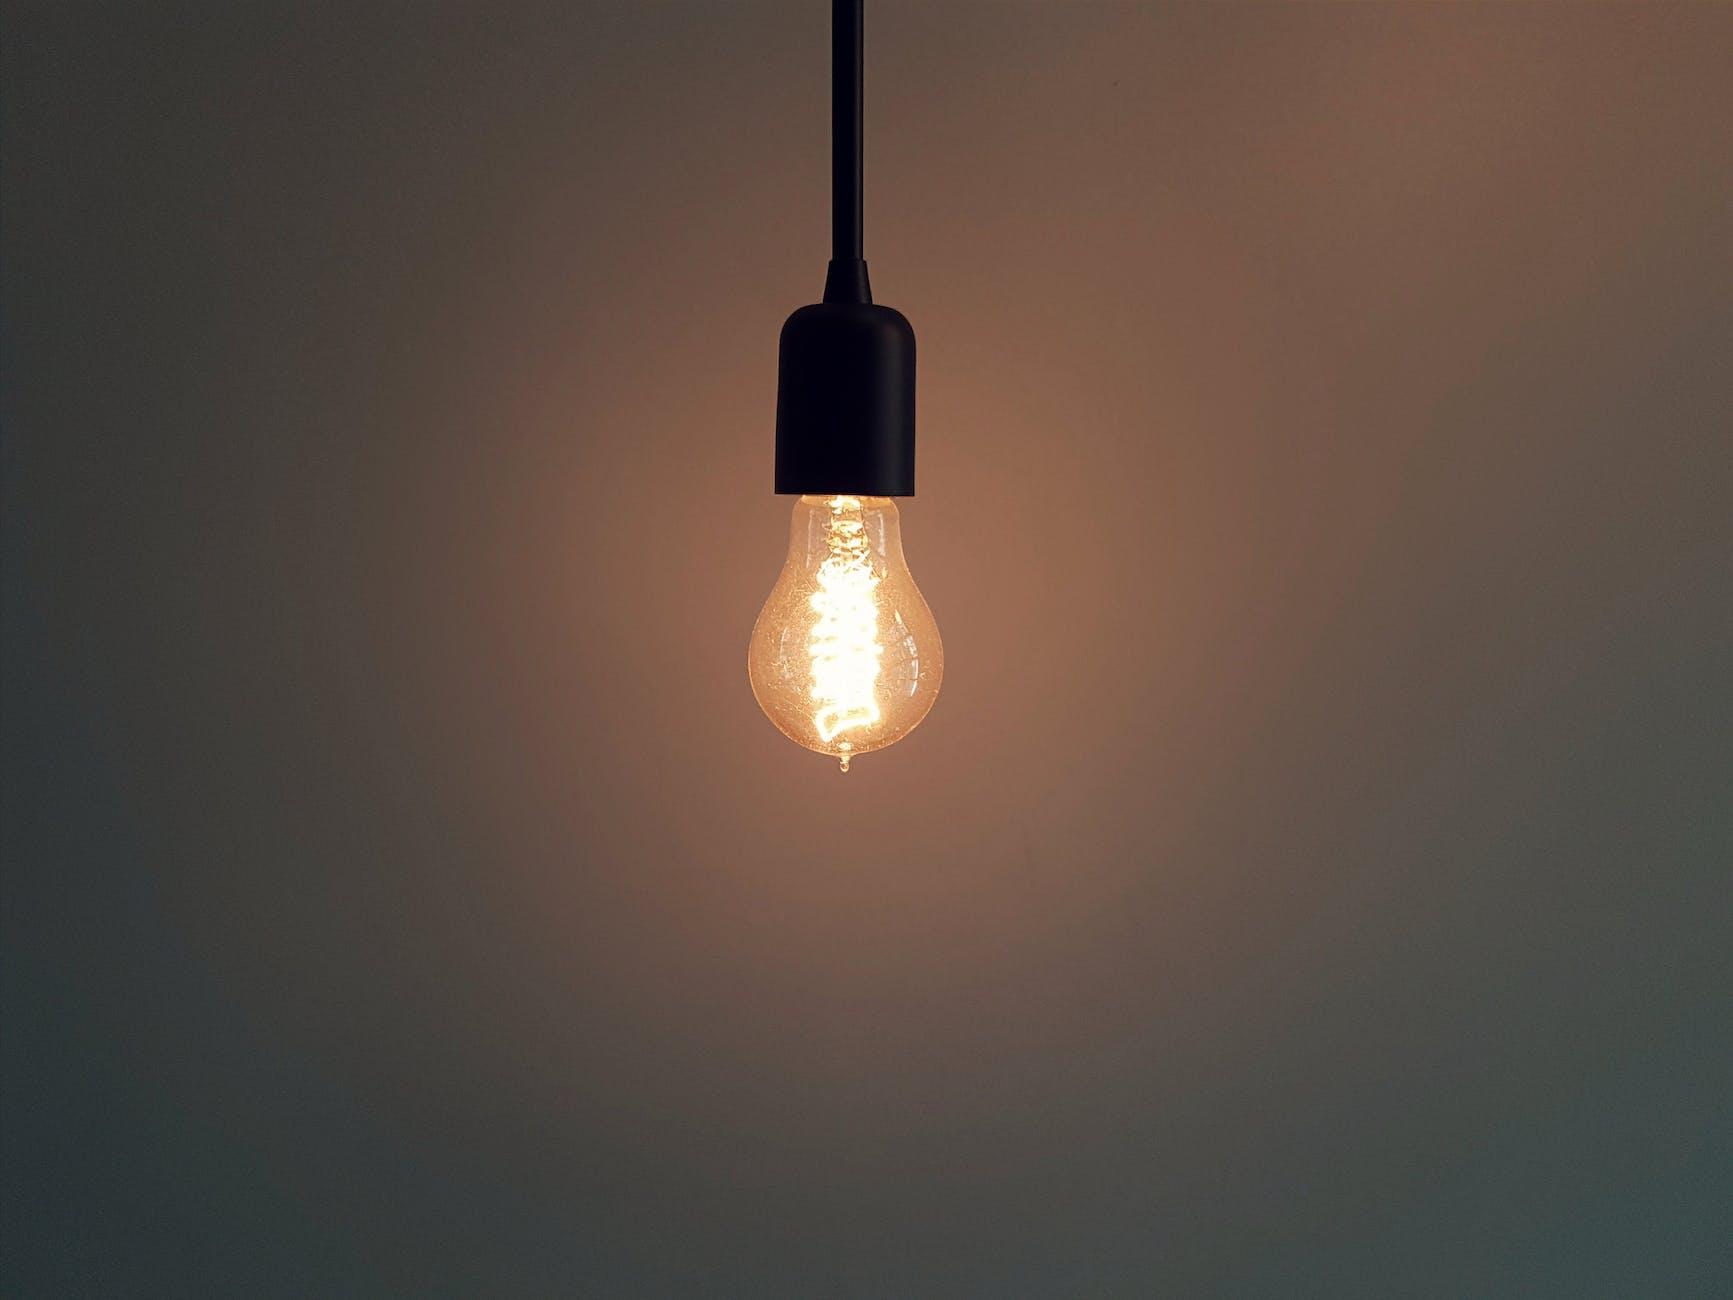 Pasos para dar de baja un suministro de luz